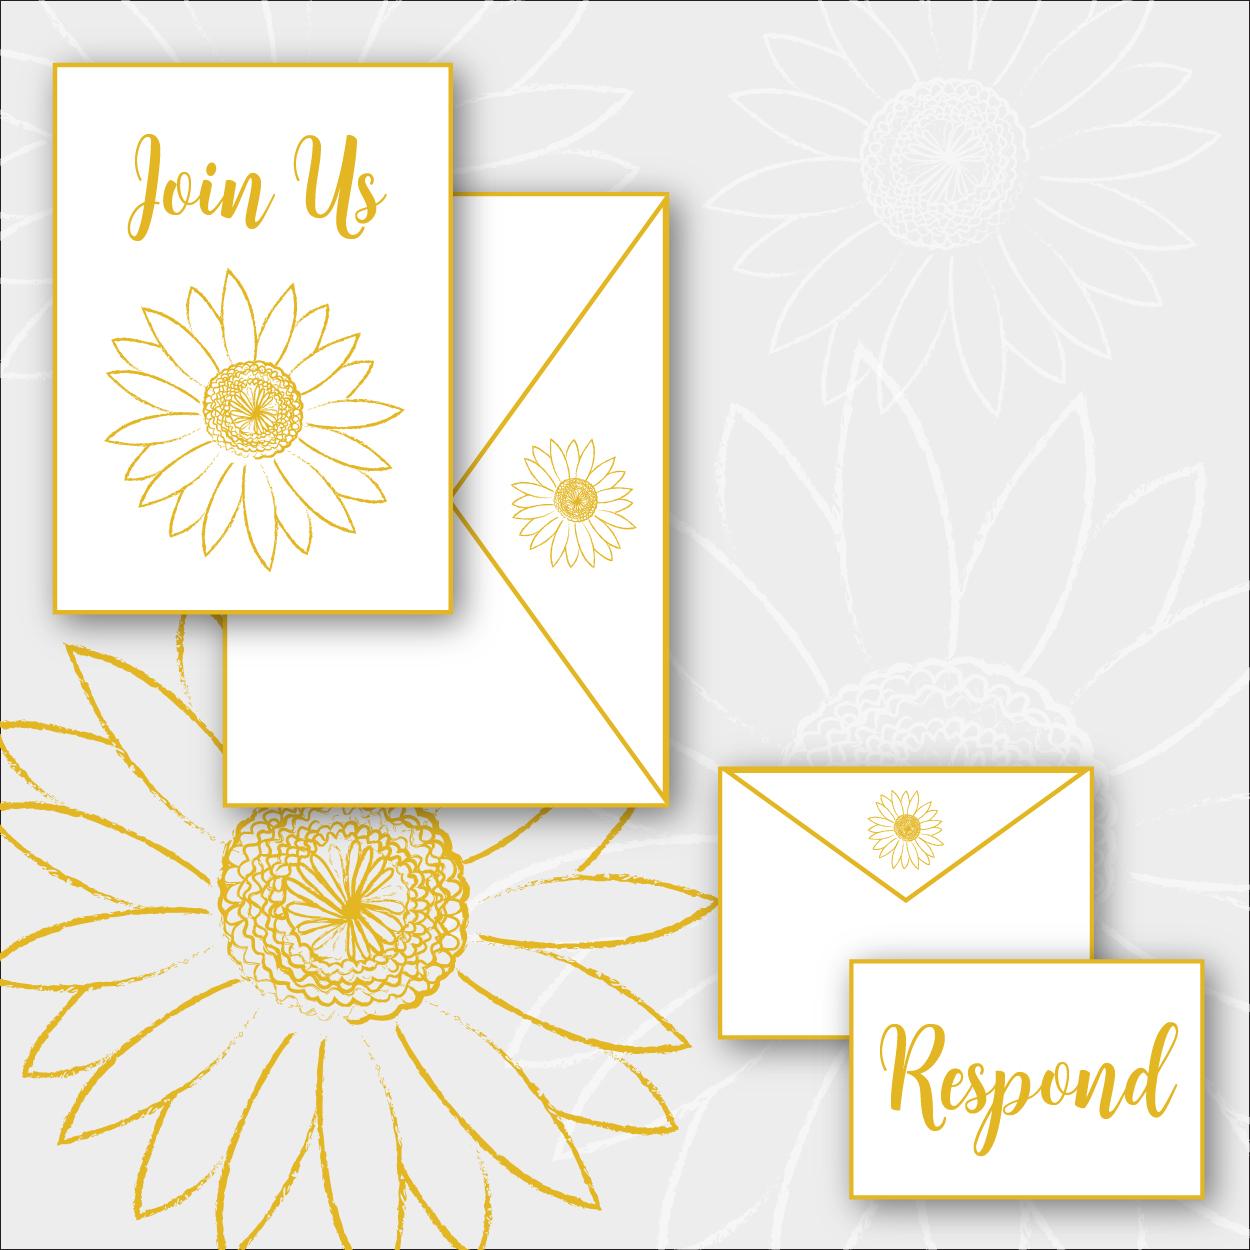 Daisy Package    >  Invitation + envelope  >  RSVP card + envelope  >  Digital printing on cotton, shimmer, or eggshell stock   $4.75 per suite + $350 custom design fee